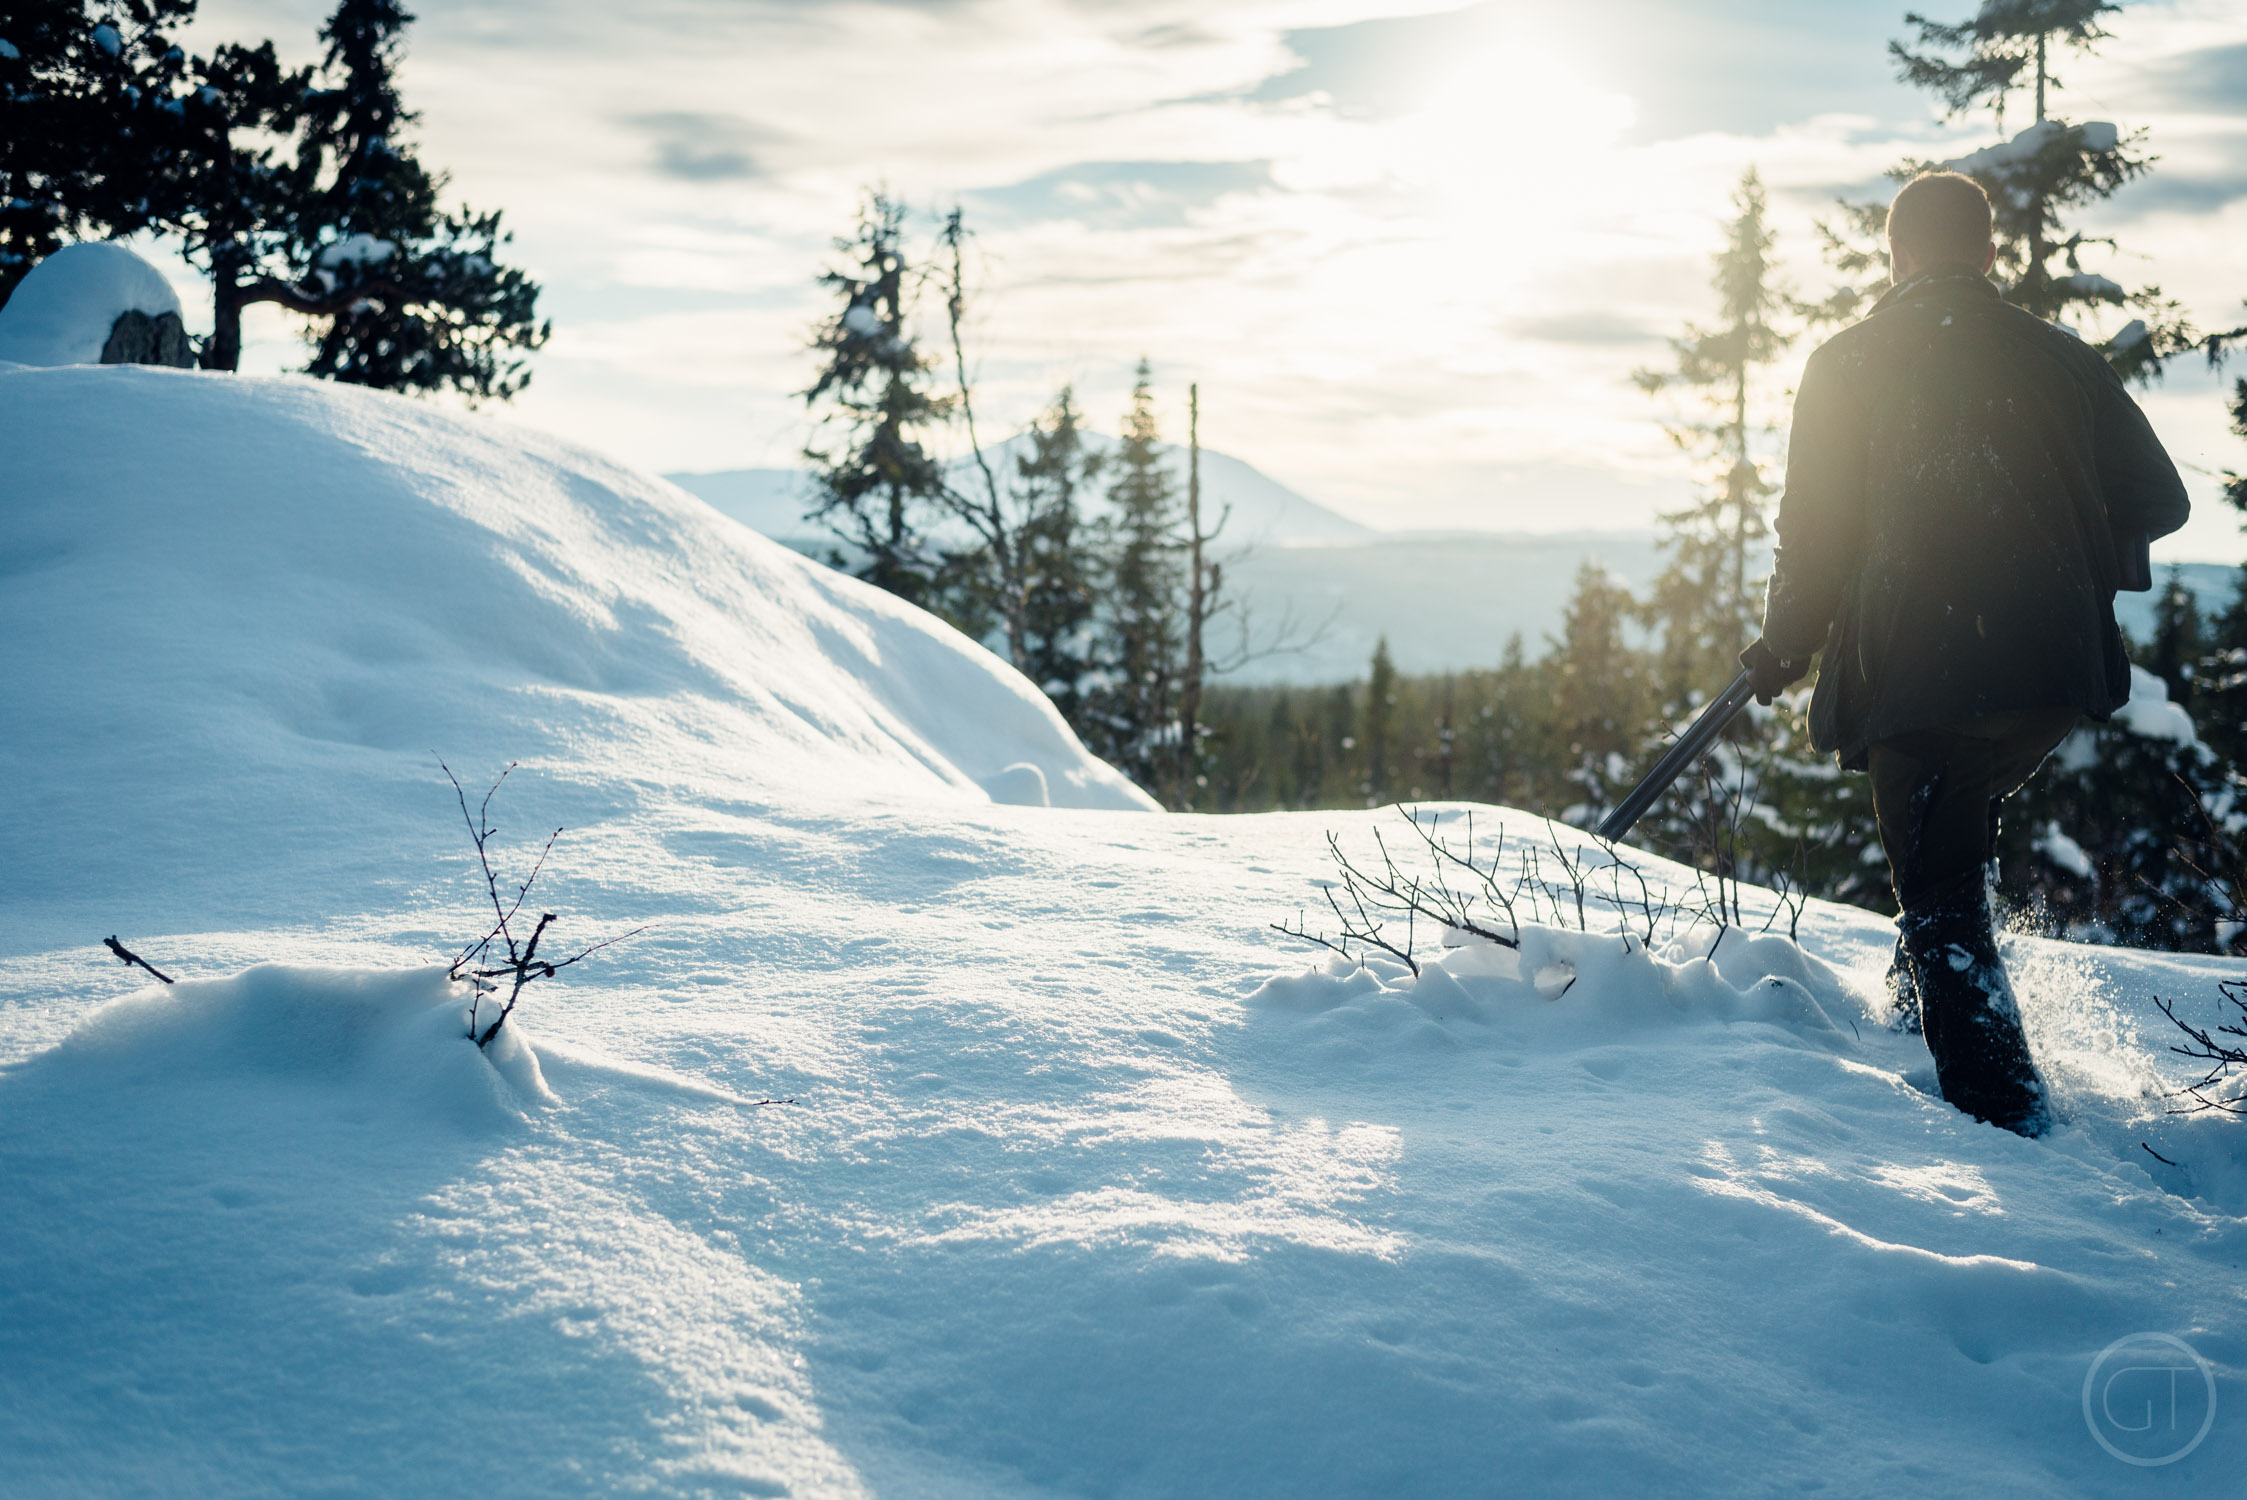 GUSTAV_THUESEN_HUNTING_NORWAY_OUTDOOR_LIFESTYLE_PHOTOGRAPHER_PROFESSIONAL-13.jpg